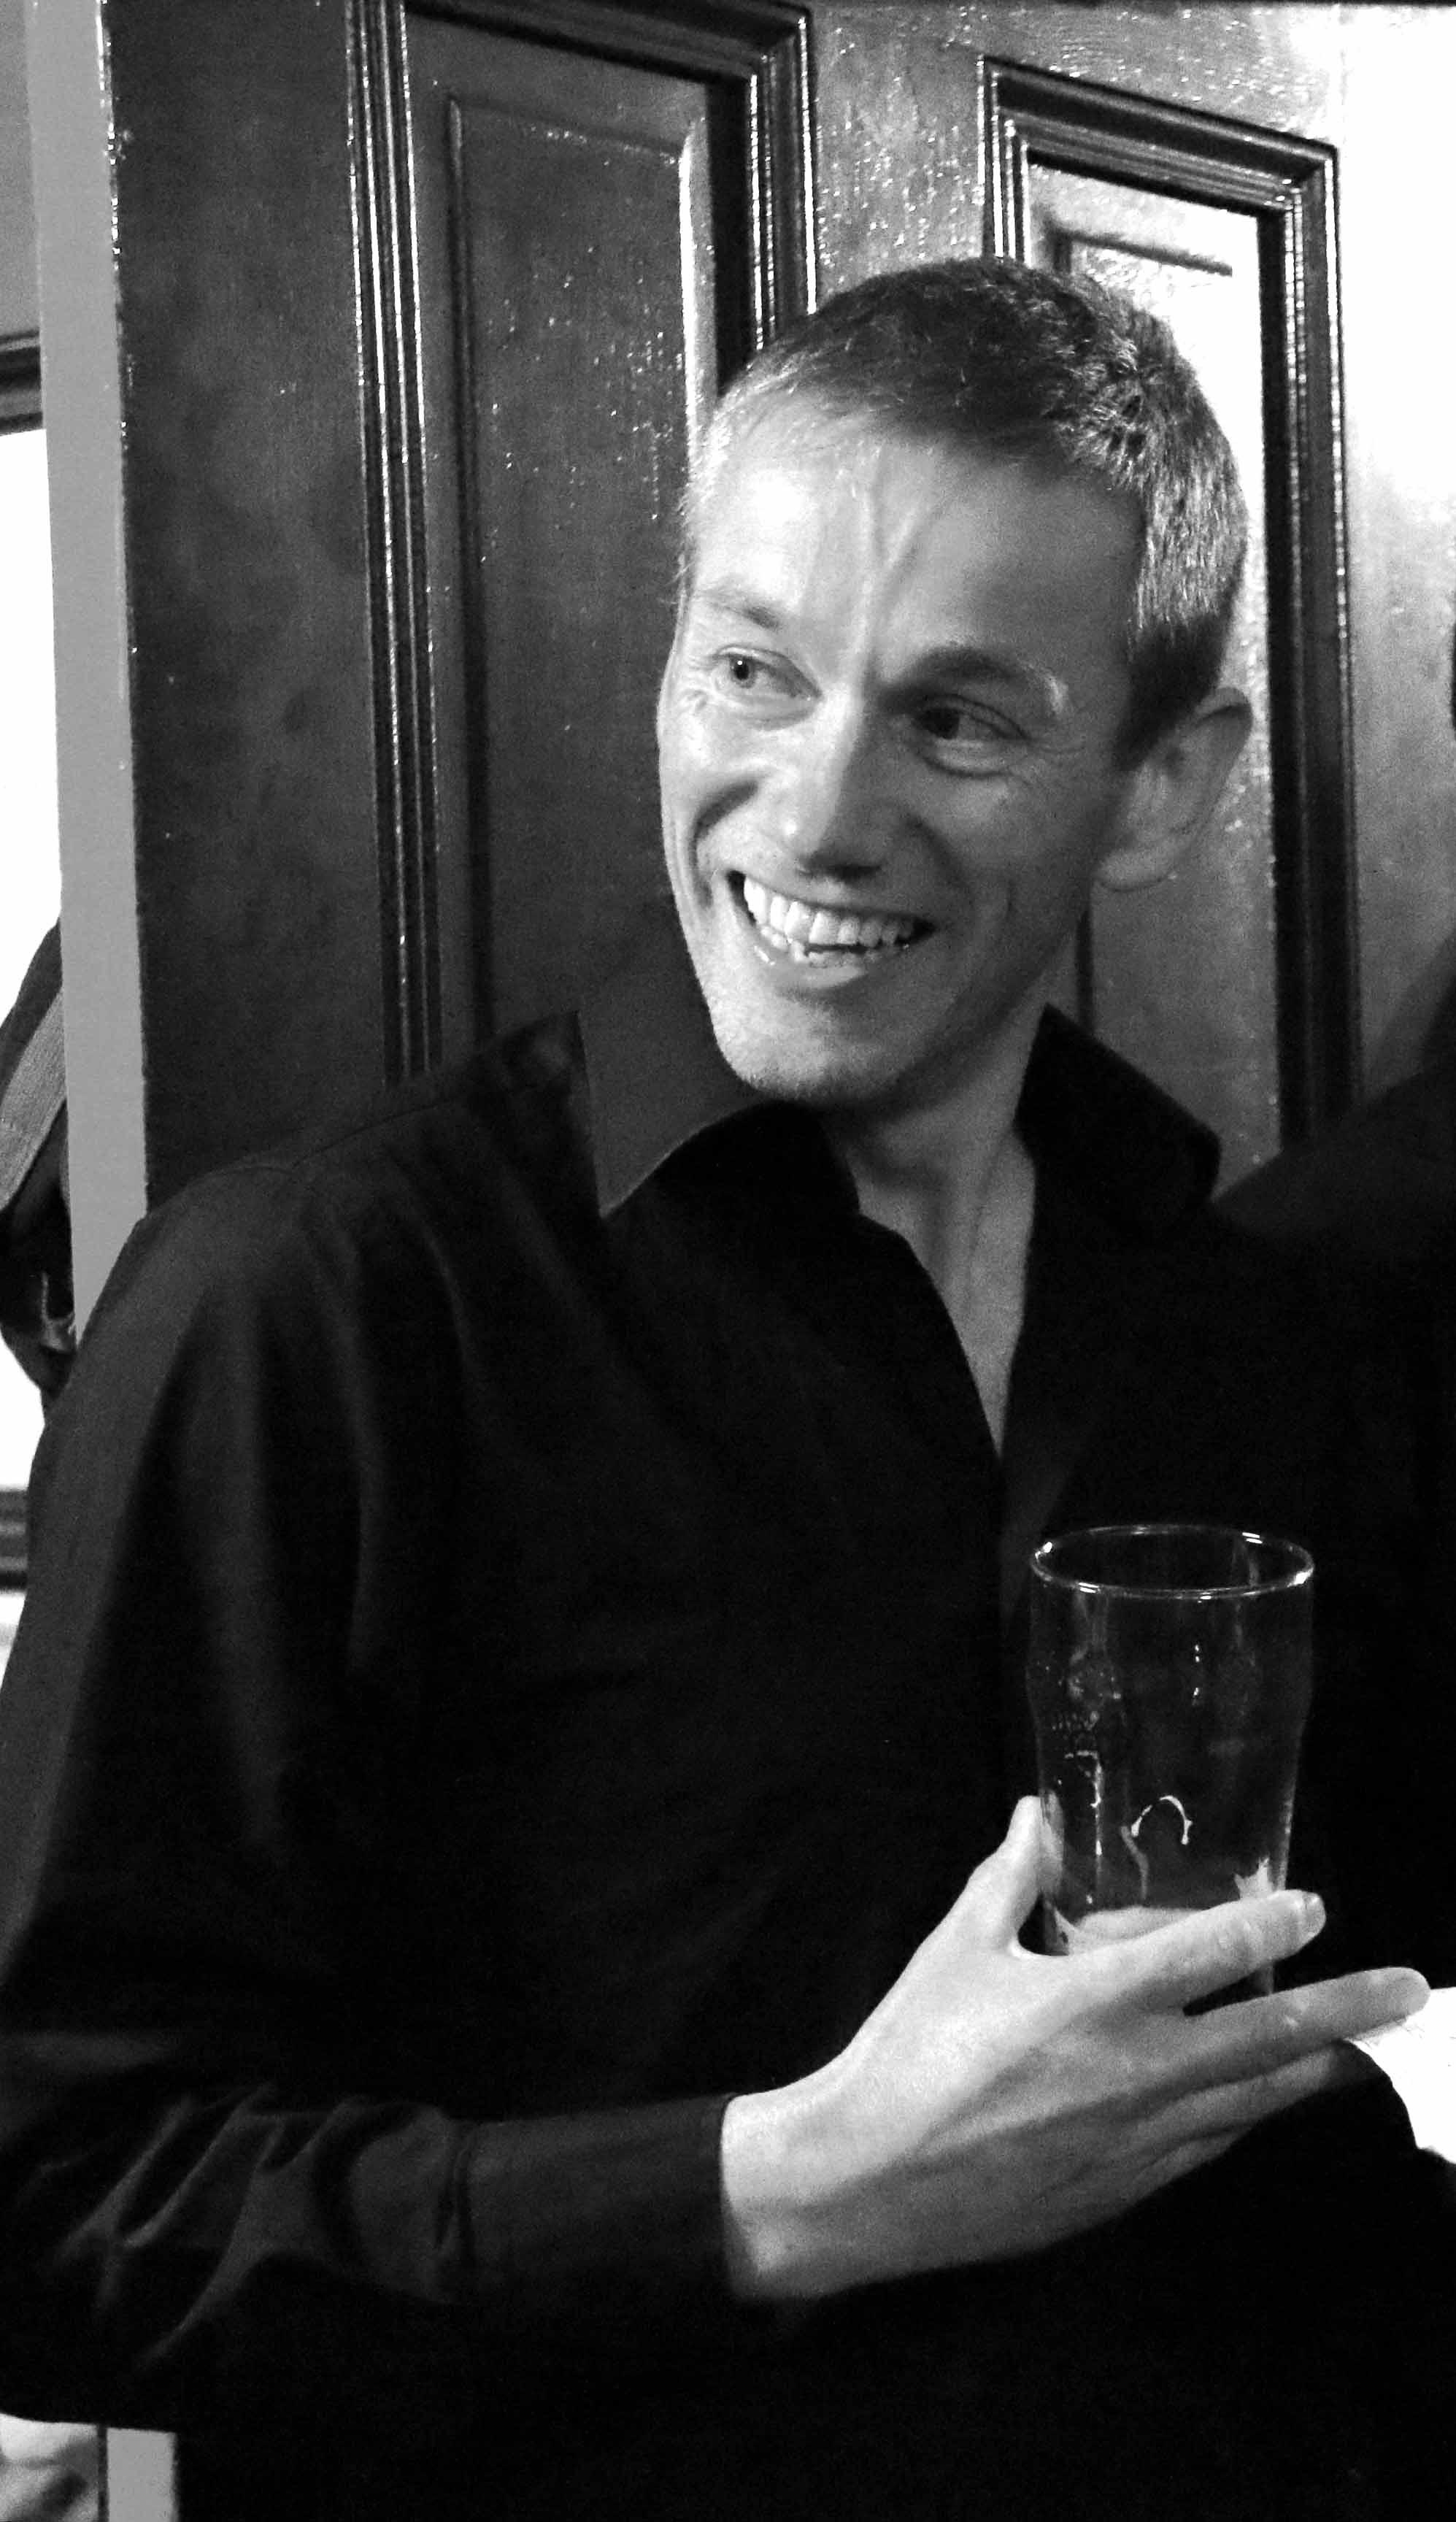 Allingham Festival Club - Mc Intyre's Saloon, Ballyshannon - Thursday Nov. 3rd 2016-7.jpg